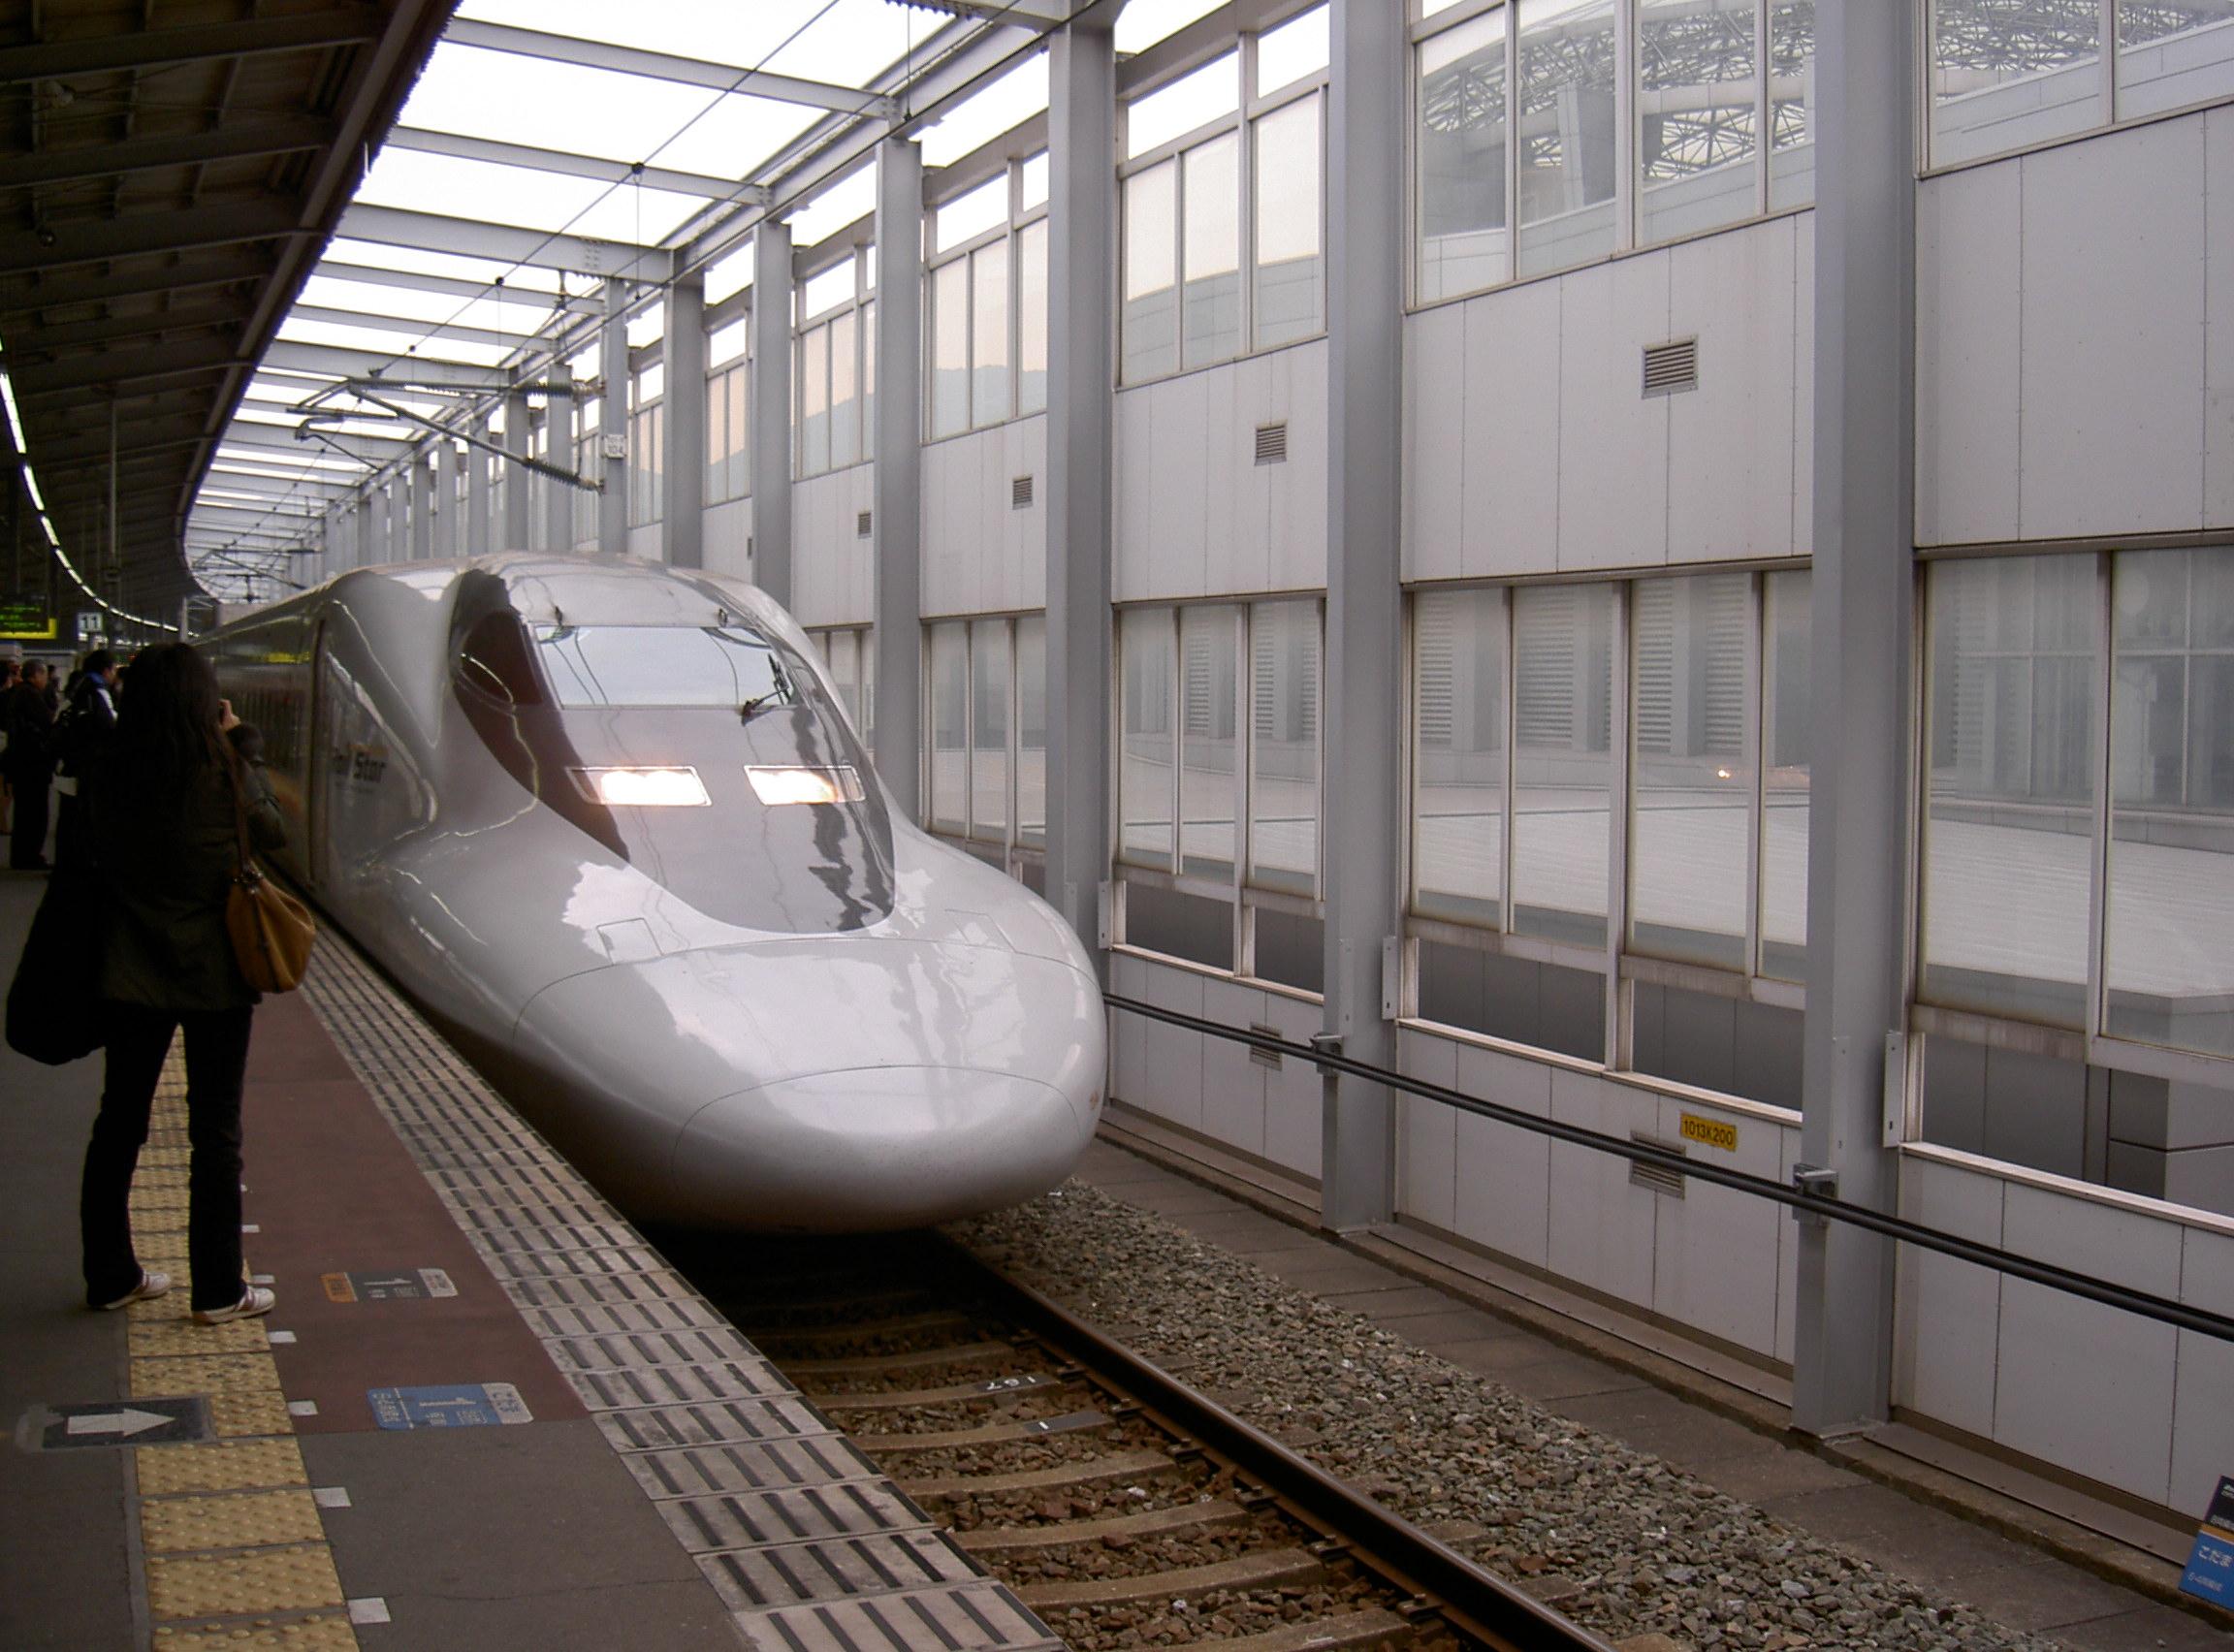 JR-700_7000-2005-2-5.jpg